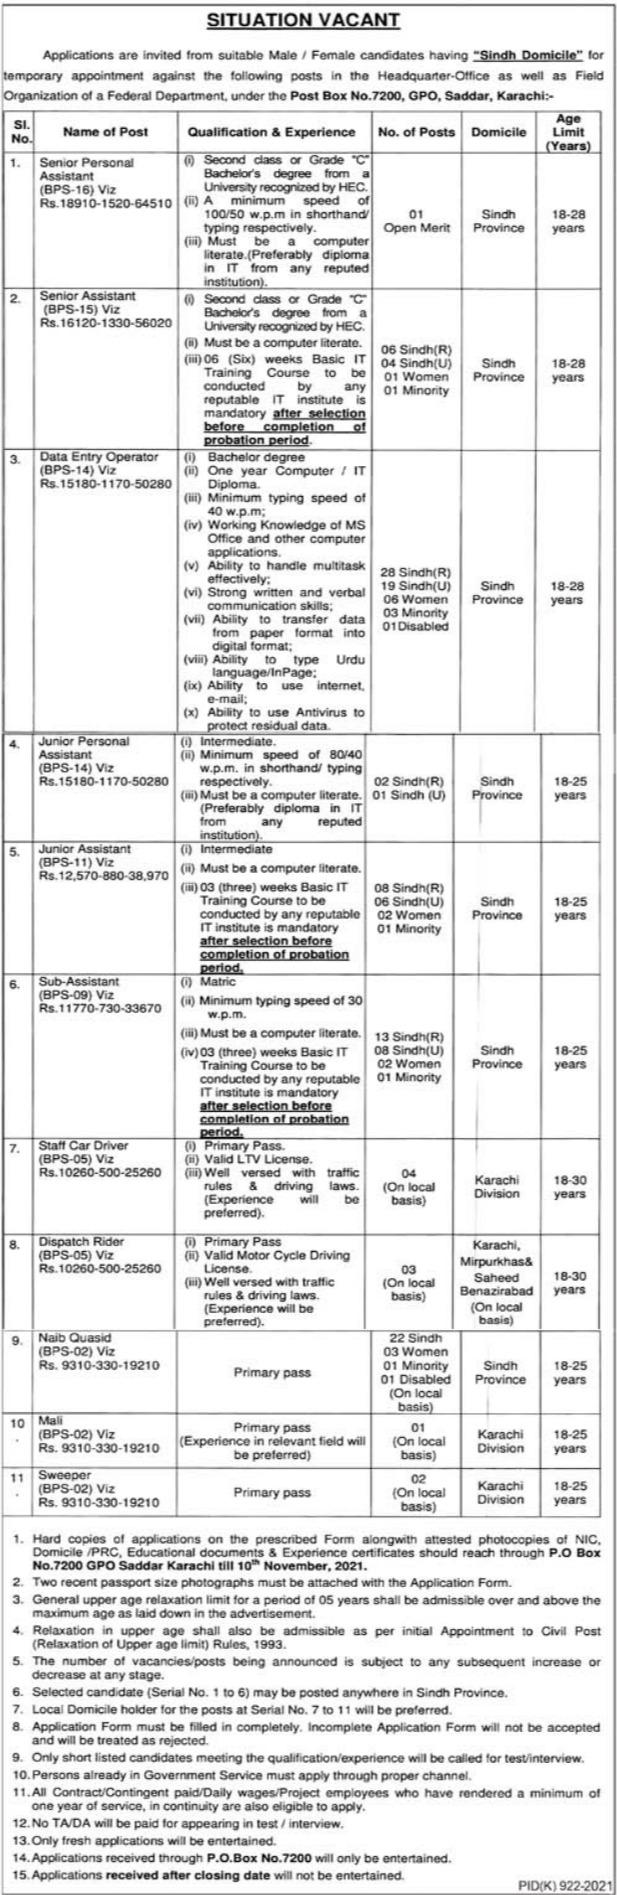 Karachi Public Sector Organization Jobs 2021